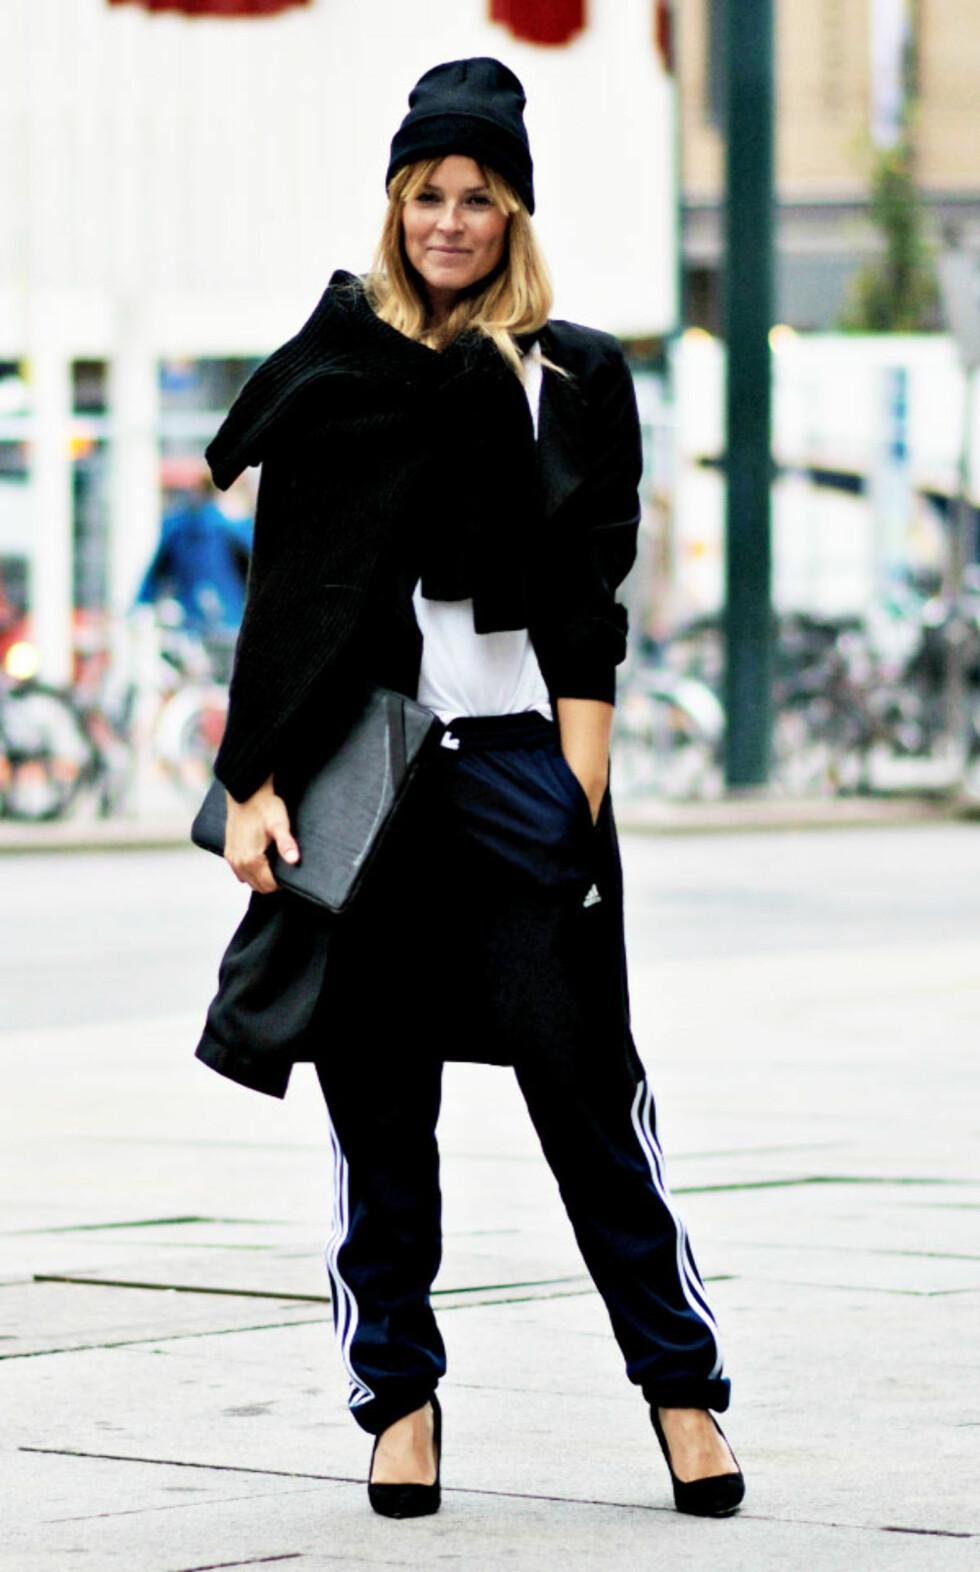 STYLEmag-blogger Janka Polliani kombinerte joggebukser fra Adidas med slanke pumps. Foto: All Over